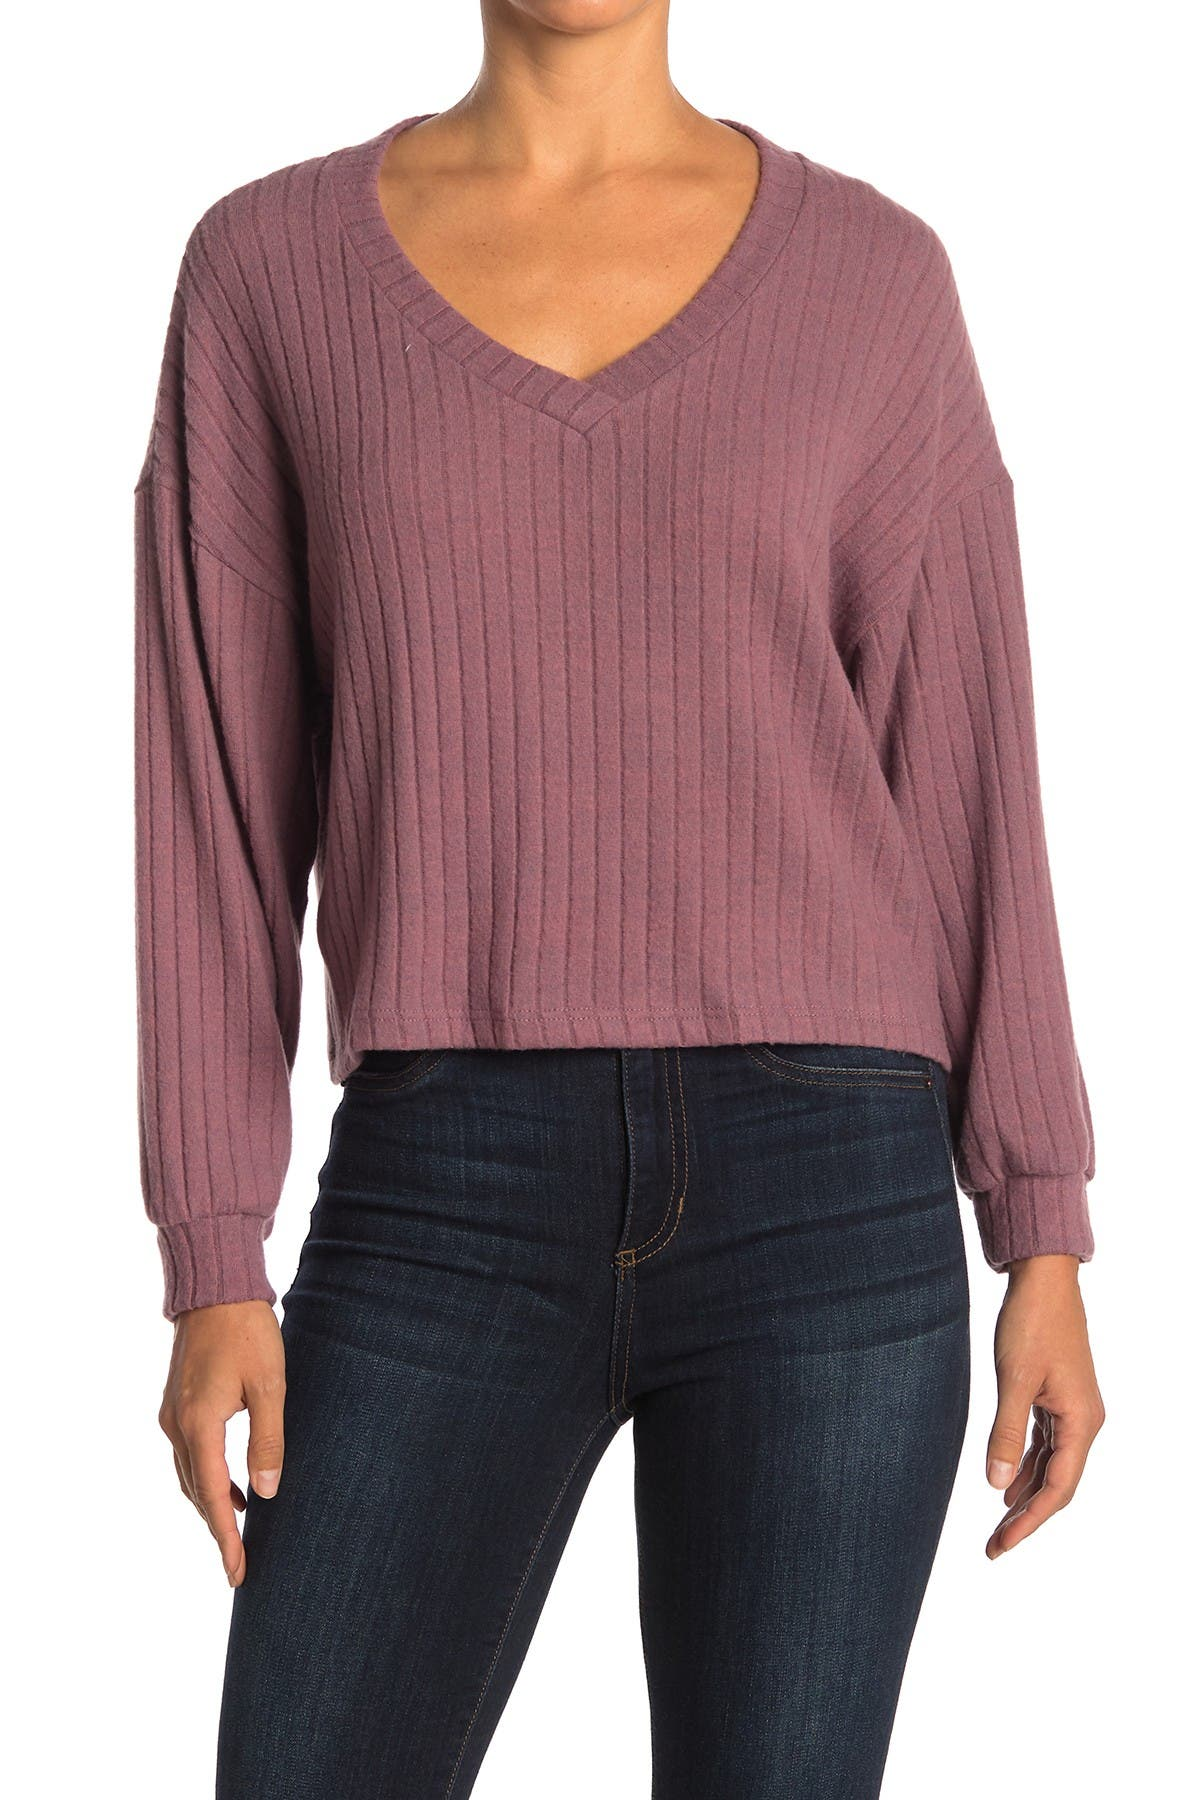 Image of Lush Boxy Wide Ribbed Knit Sweater